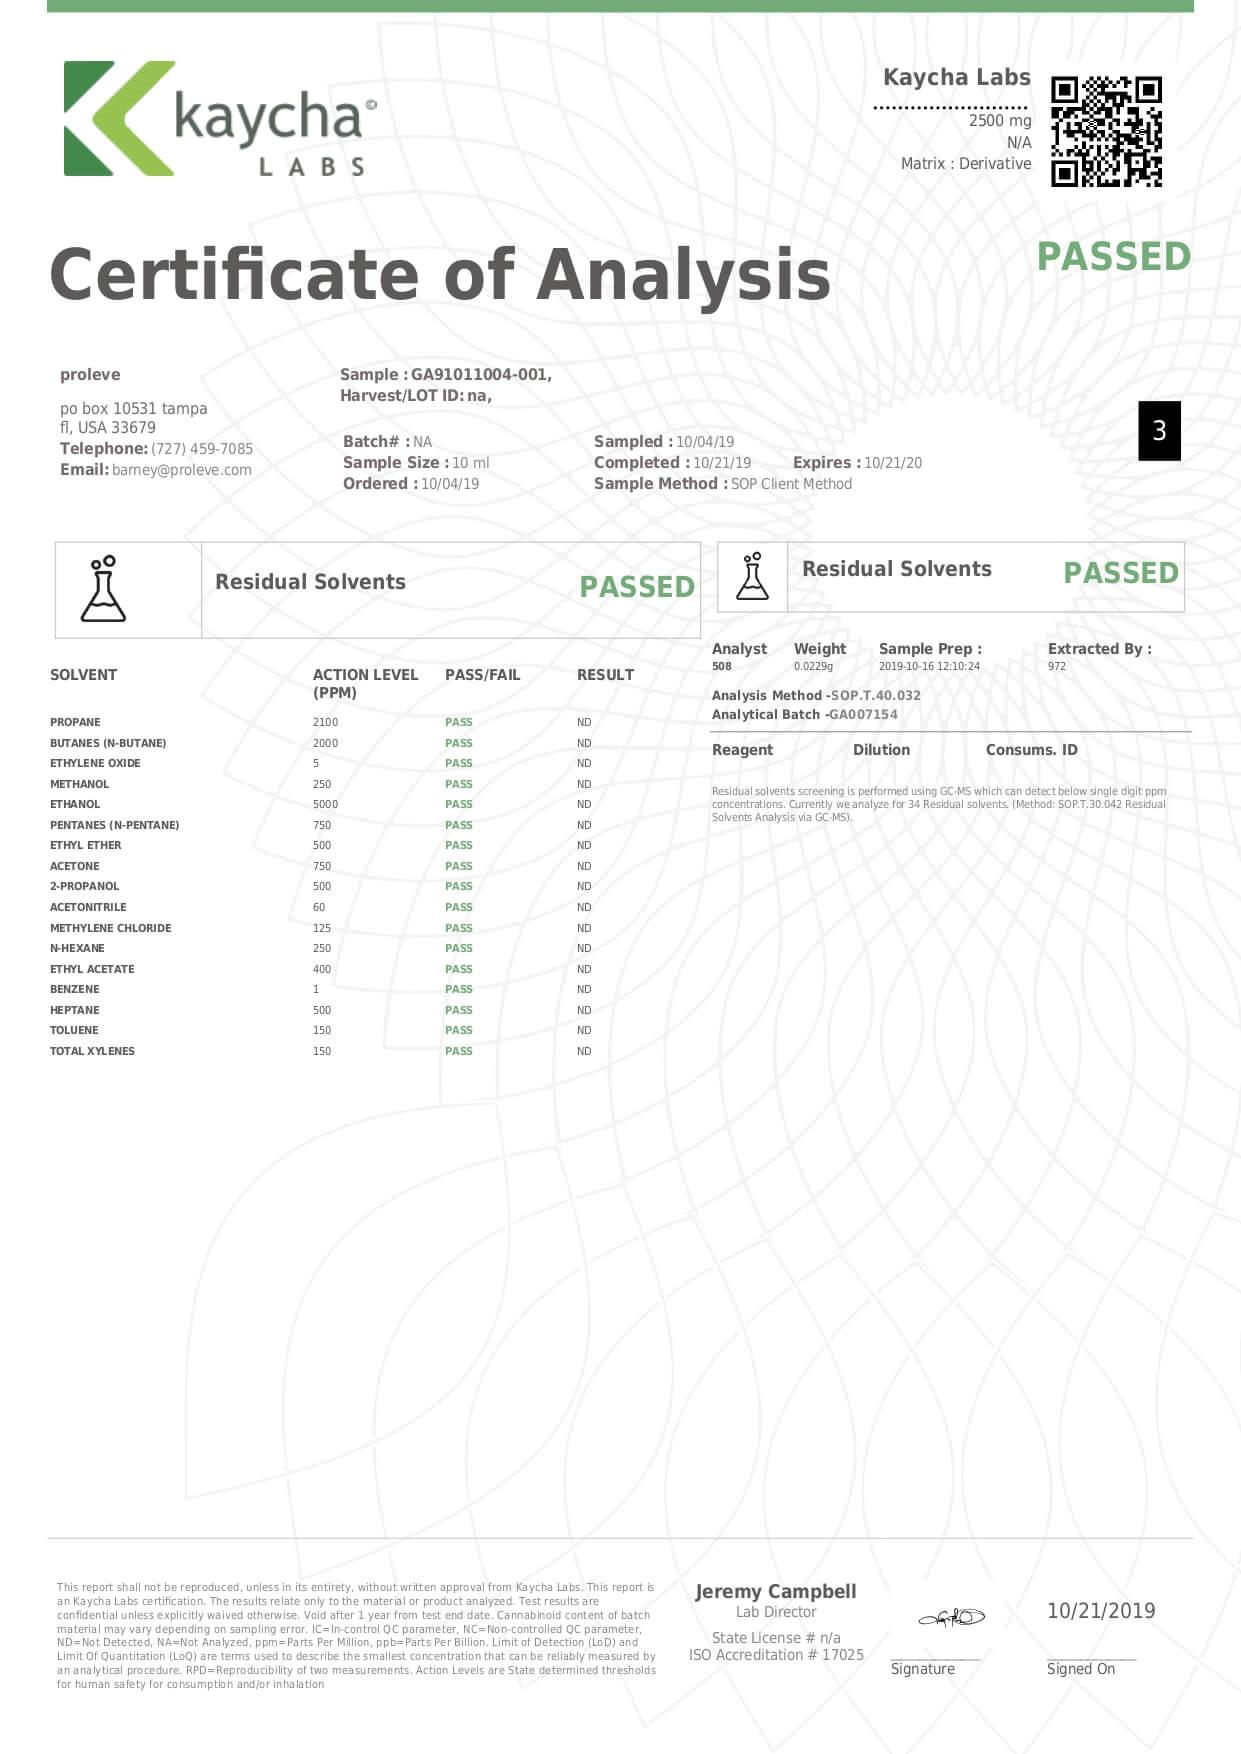 Proleve CBD Tincture Broad Spectrum Oil 2500mg Lab Report